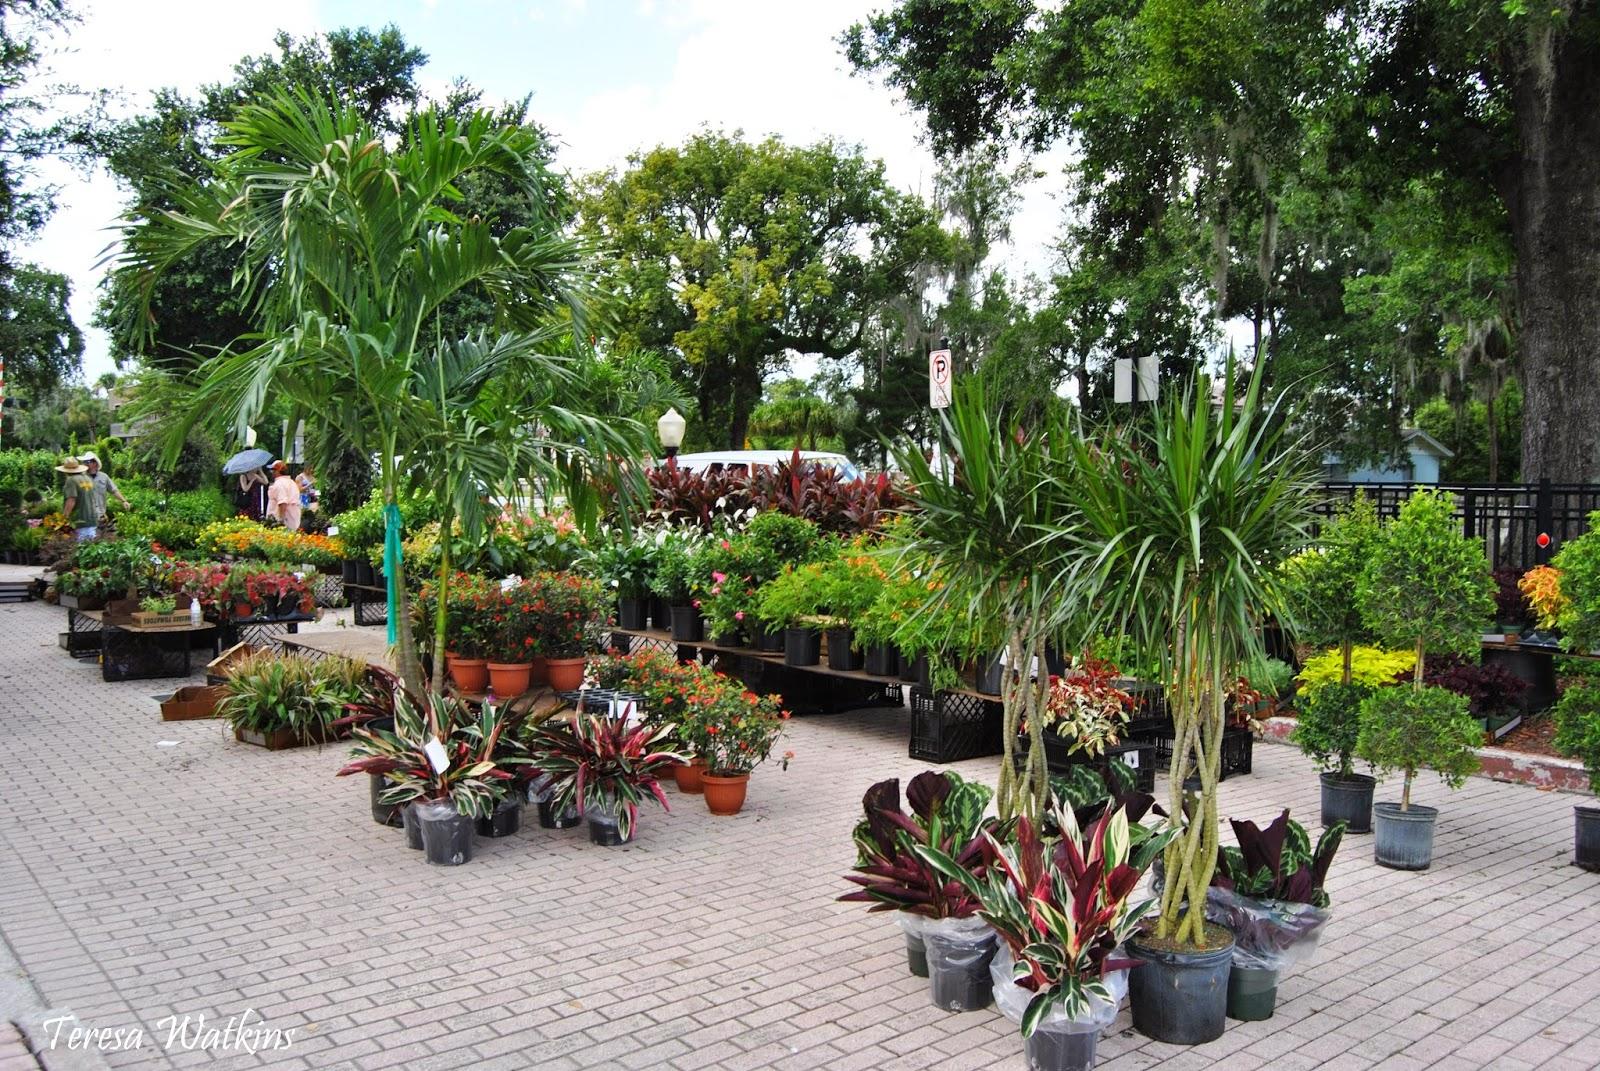 Earth Shattering Gardening Winter Park Horticulture